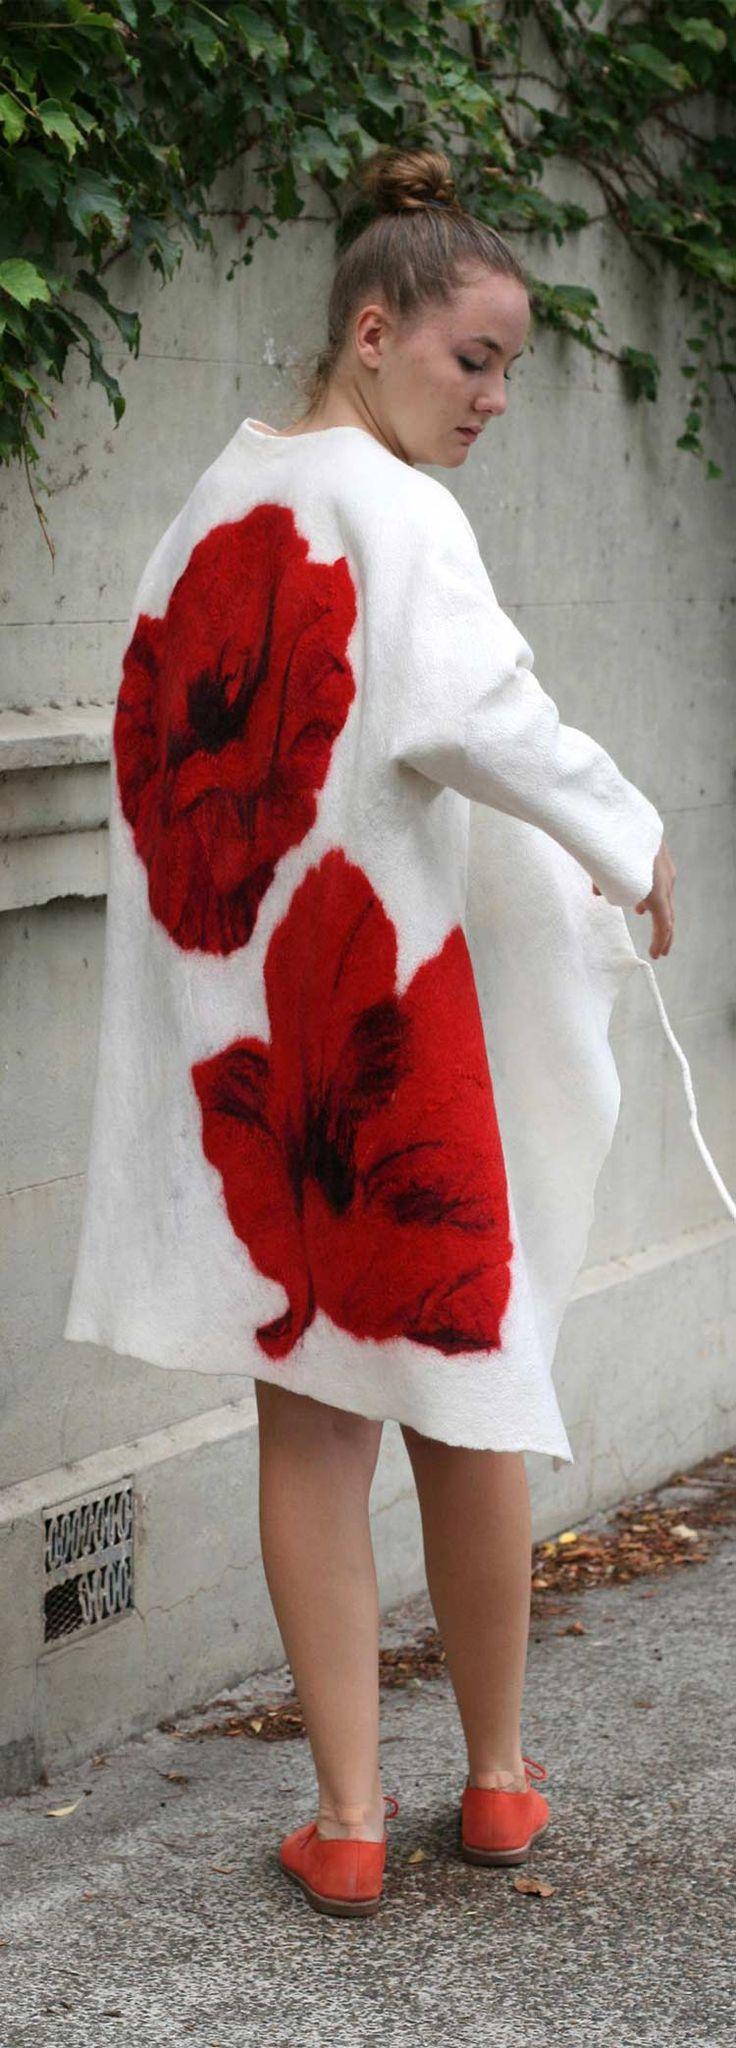 Buy now fashion style wool summer coat by Vera Alexanderova. #wool #coat #felt #filz #feltro #handmade #womensfashion #felted #merino